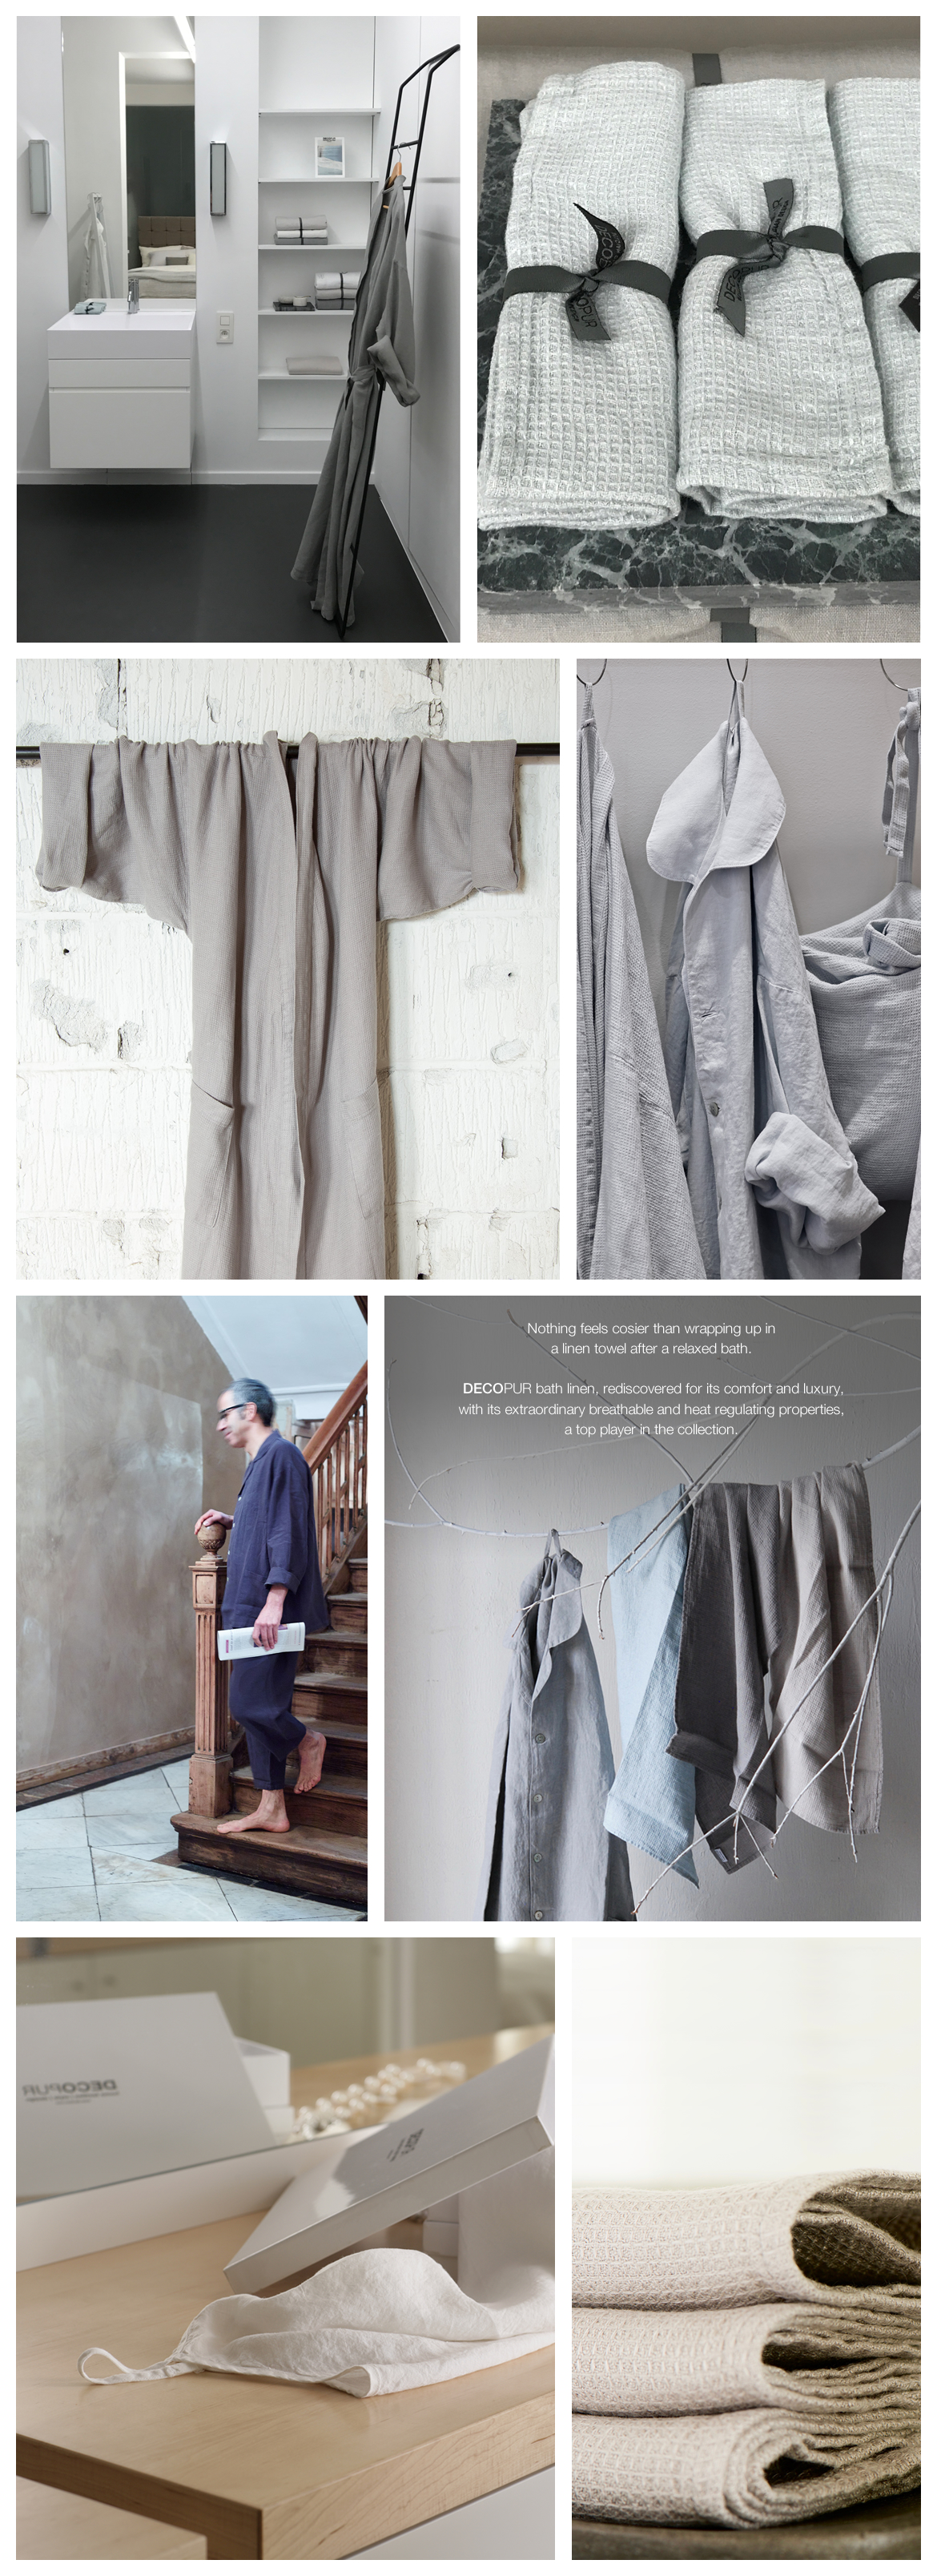 Home Linen By Decopur